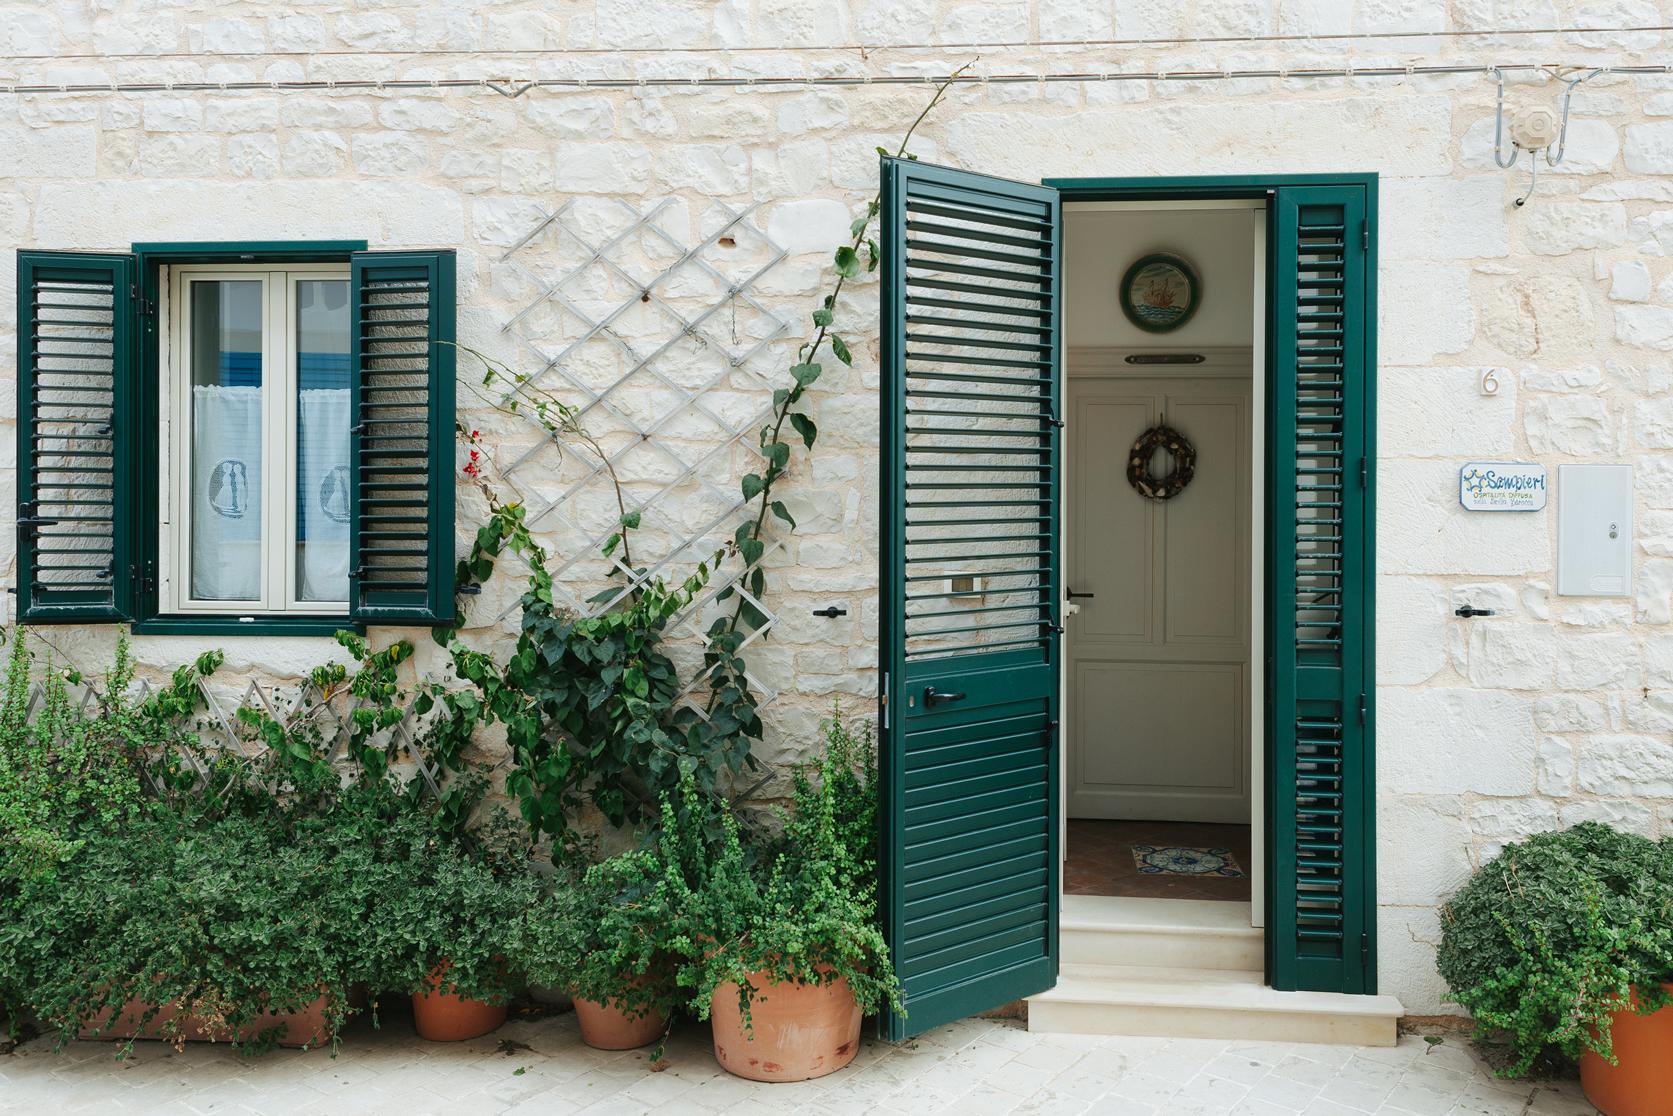 1sampieri-casa-vacanze-sicilia-appartamento-sicily-holiday-apartment-casa-di-pietra-italia-italy.jpg